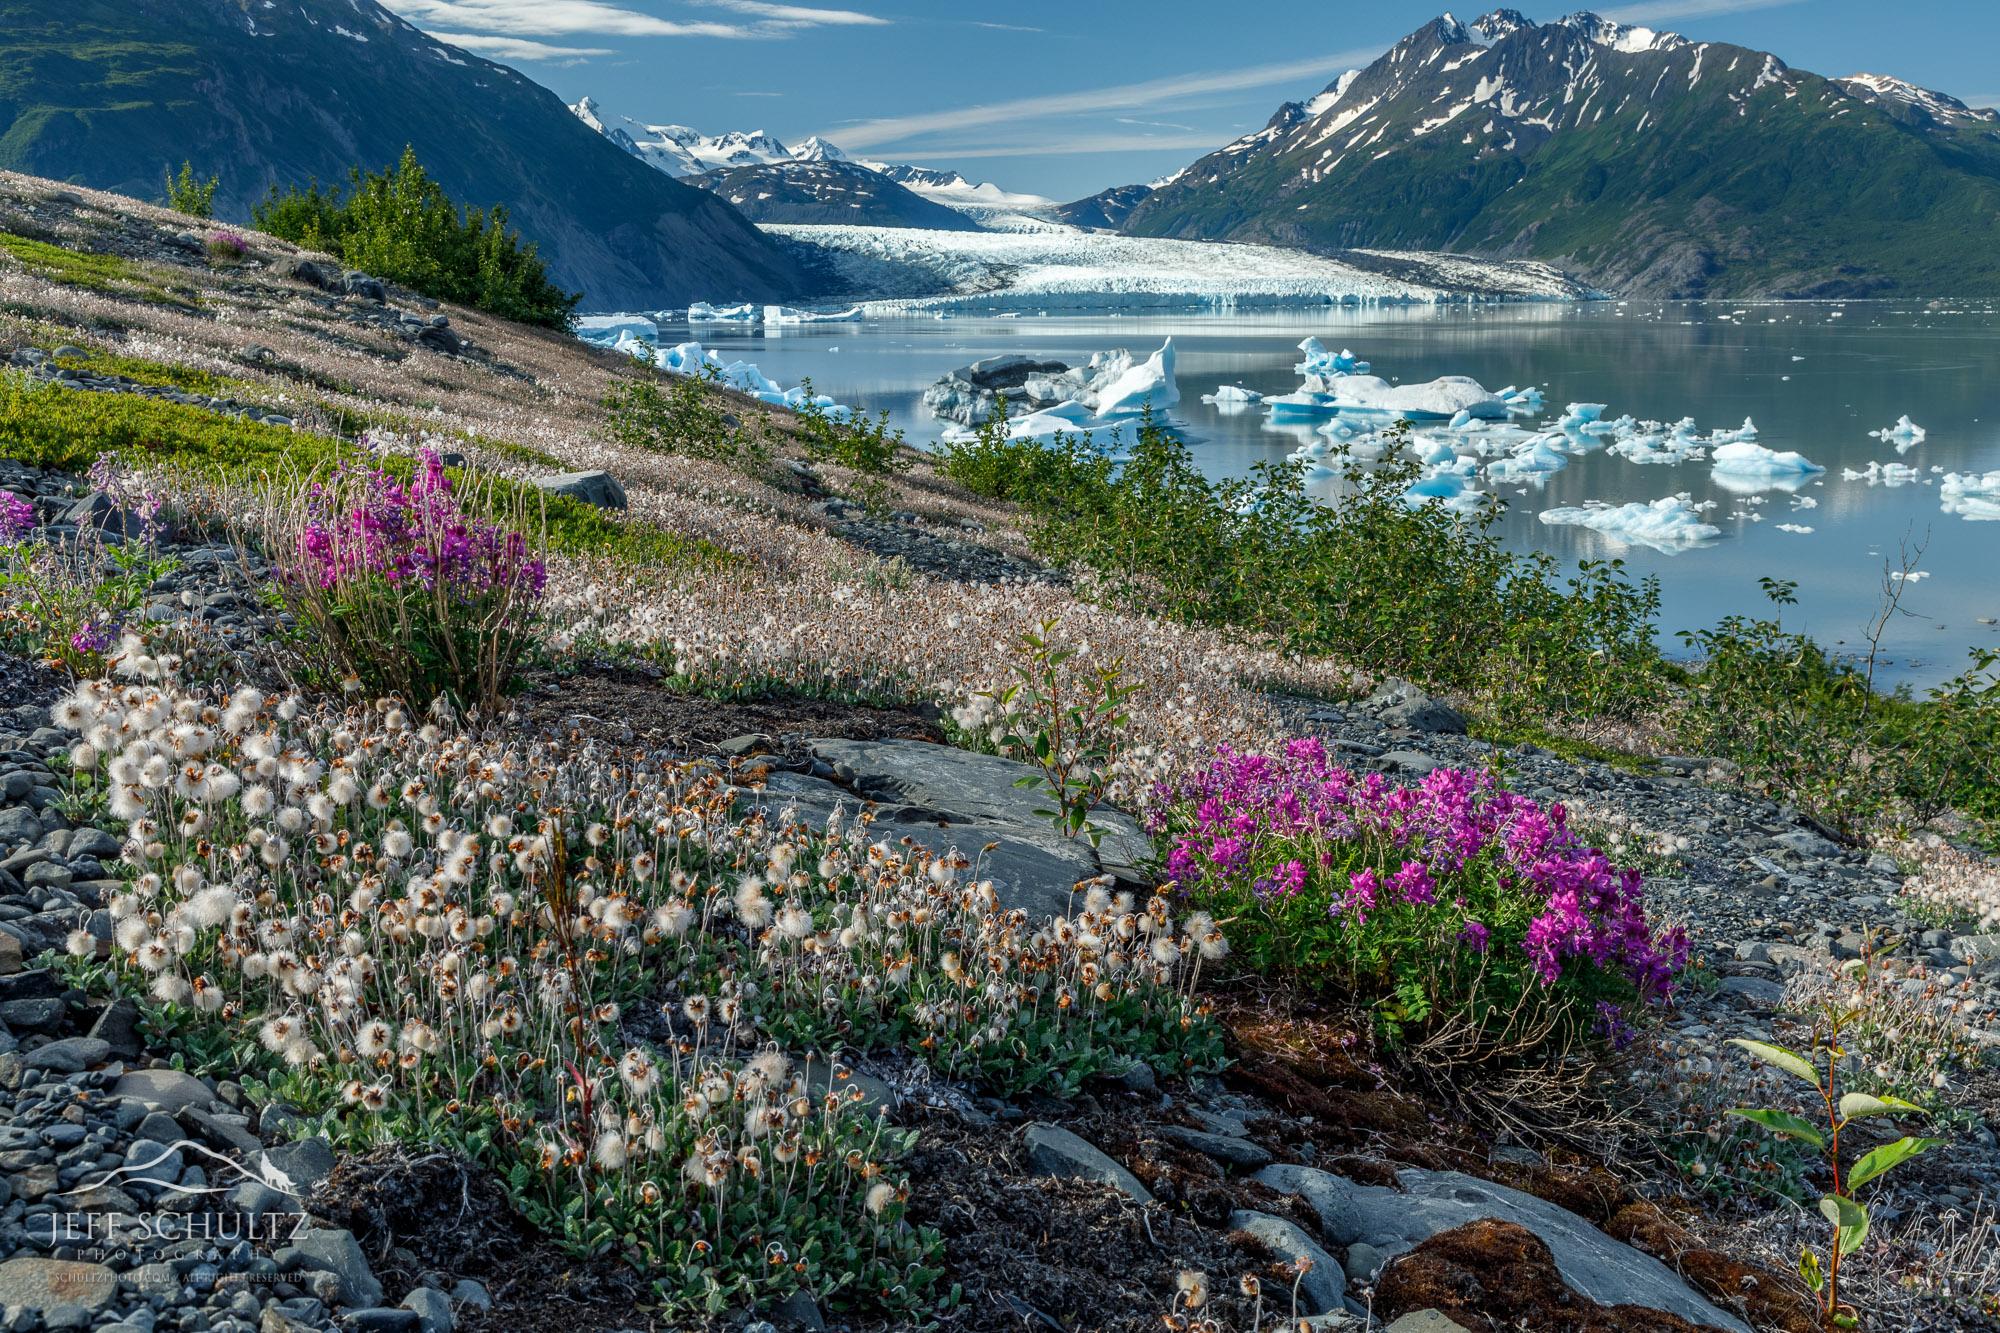 Alaska Nature & Landscapes Photographer | Jeff Schultz ...